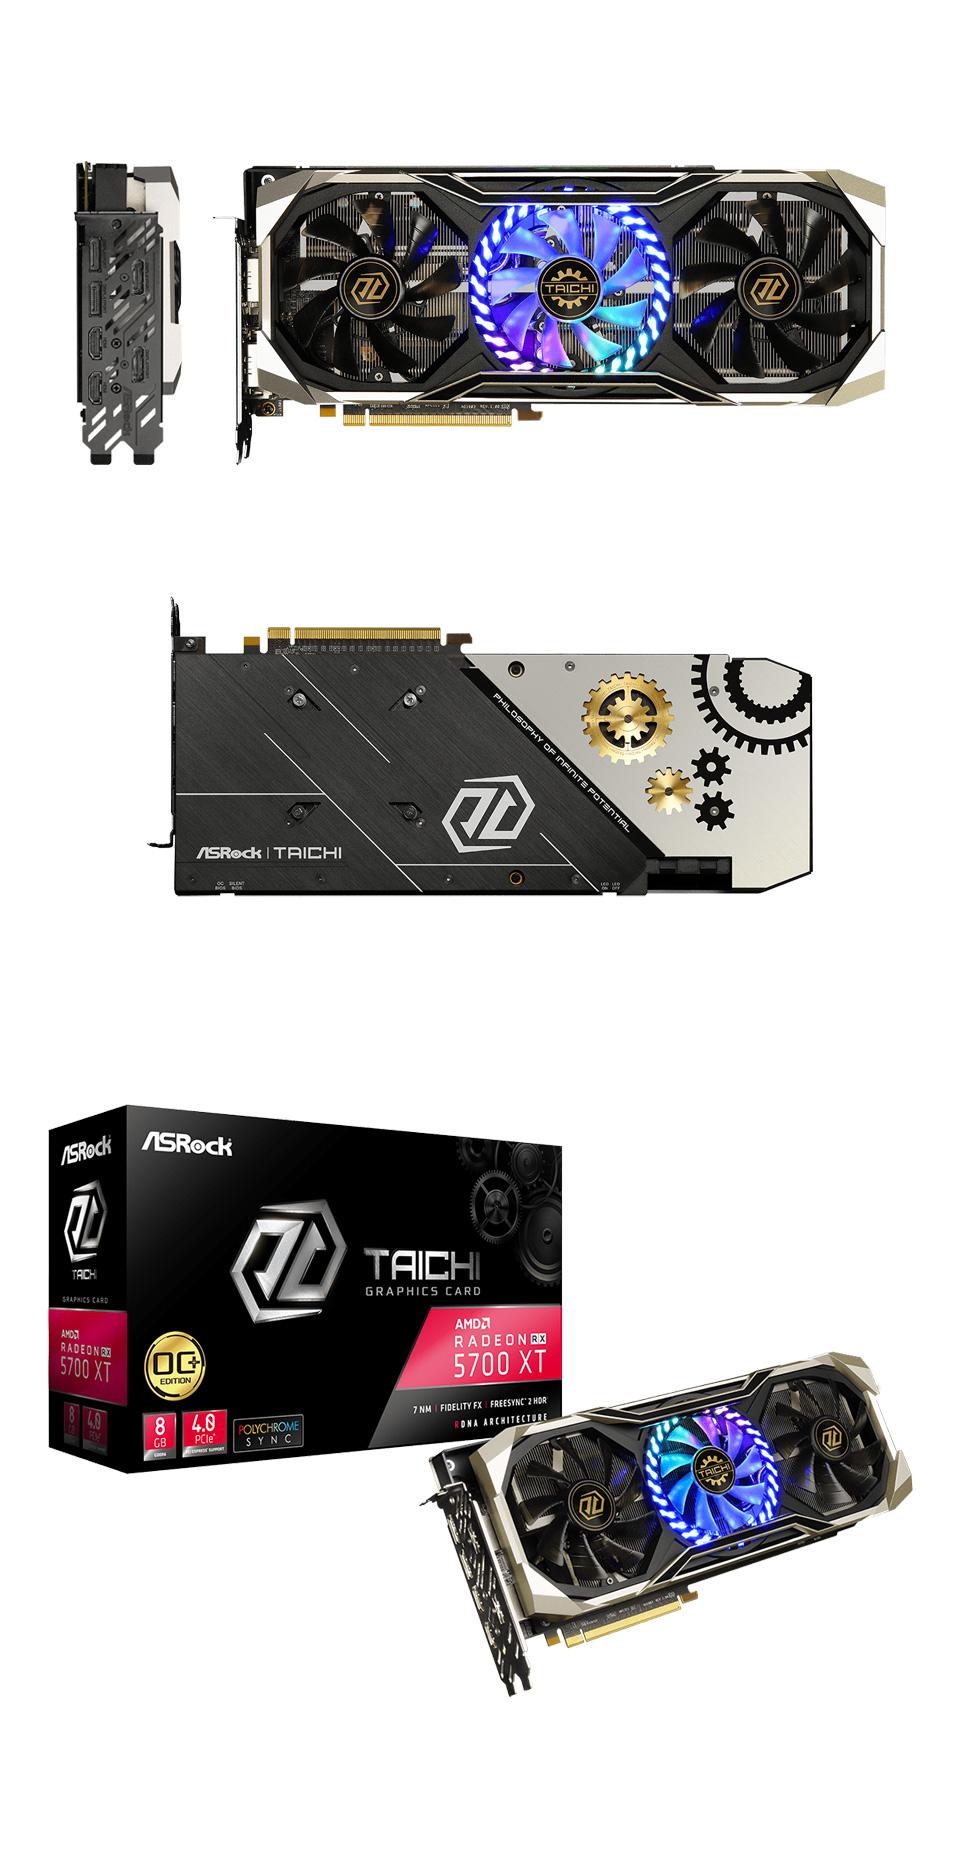 ASRock Taichi Radeon RX 5700 XT 8GB product